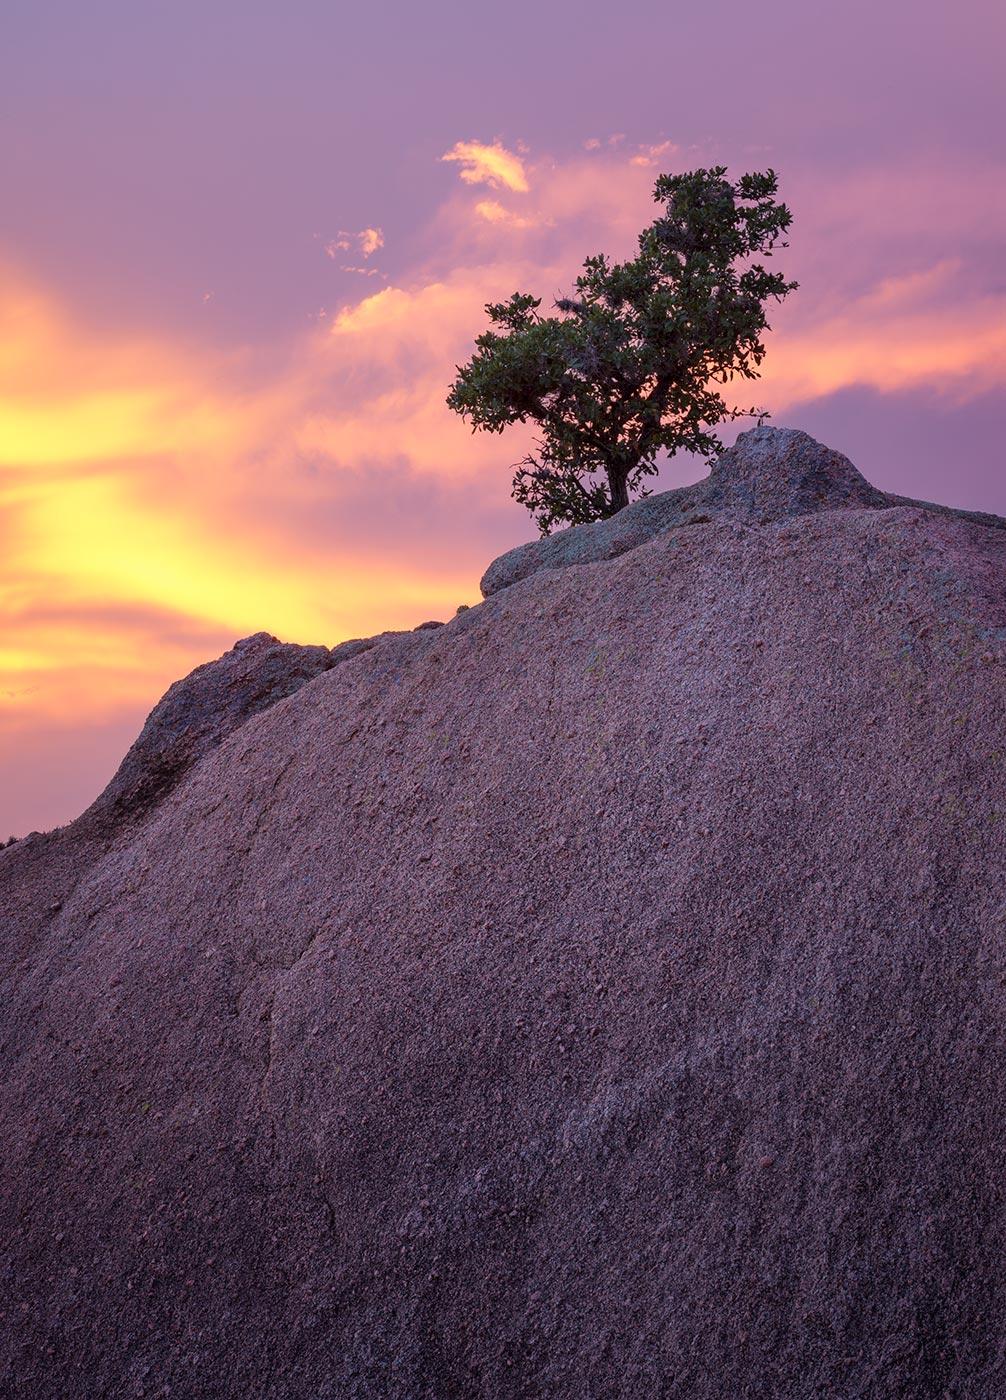 Enchanted-Rock-ABP-Boulder_tree.jpg